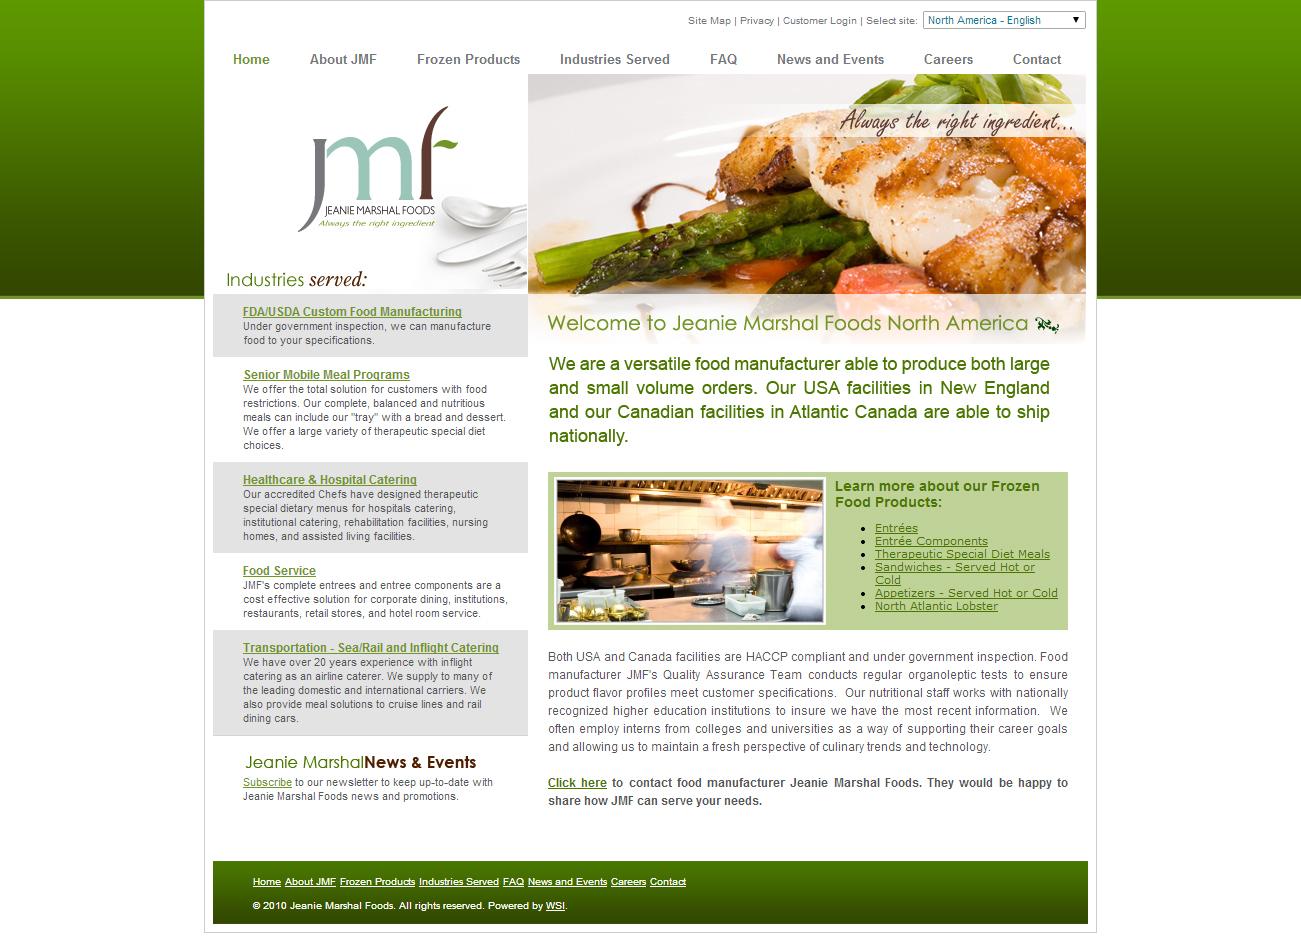 Jeanie Marshal Foods